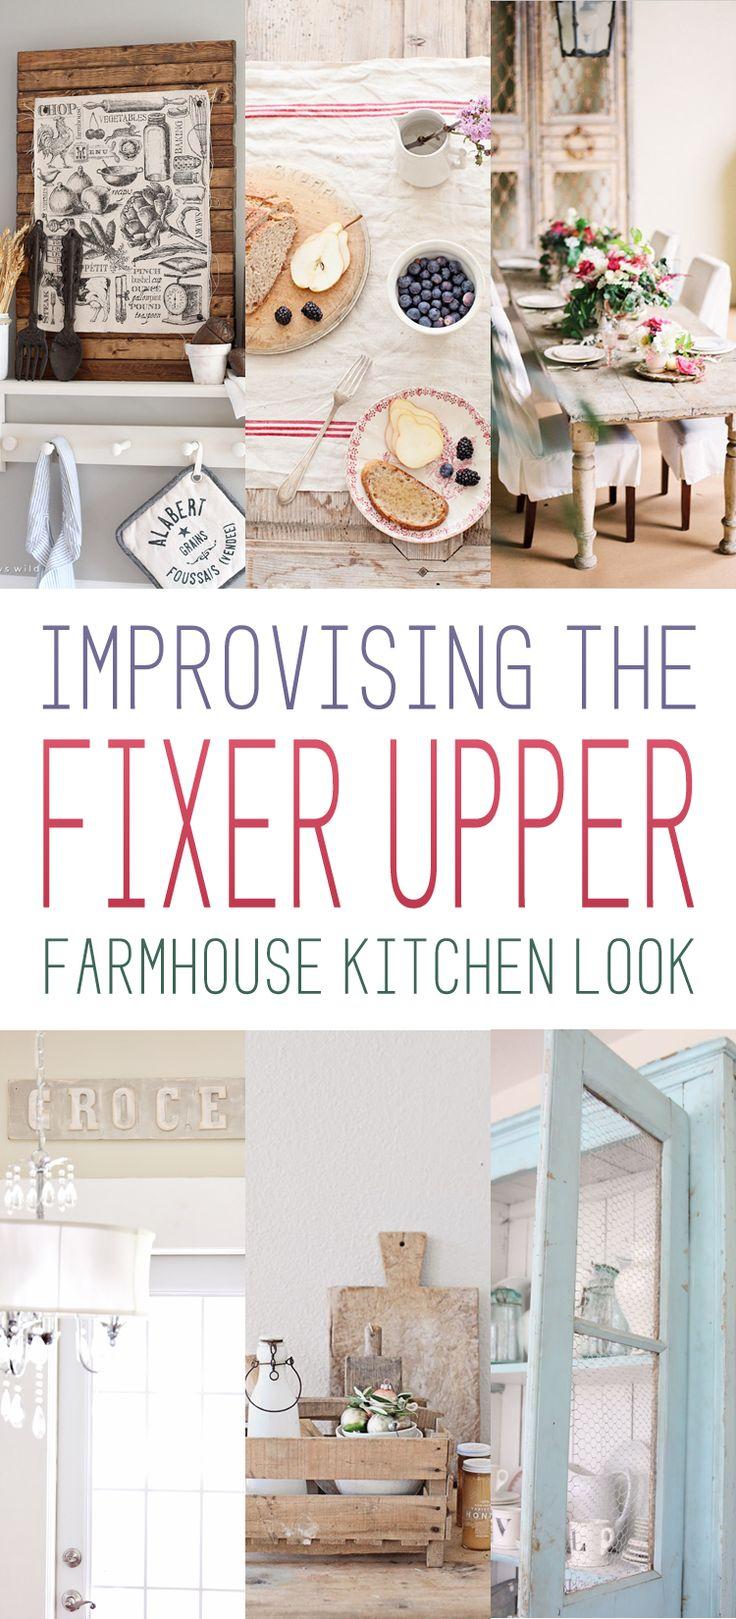 Improvising The Fixer Upper Farmhouse Kitchen Look - The Cottage Market